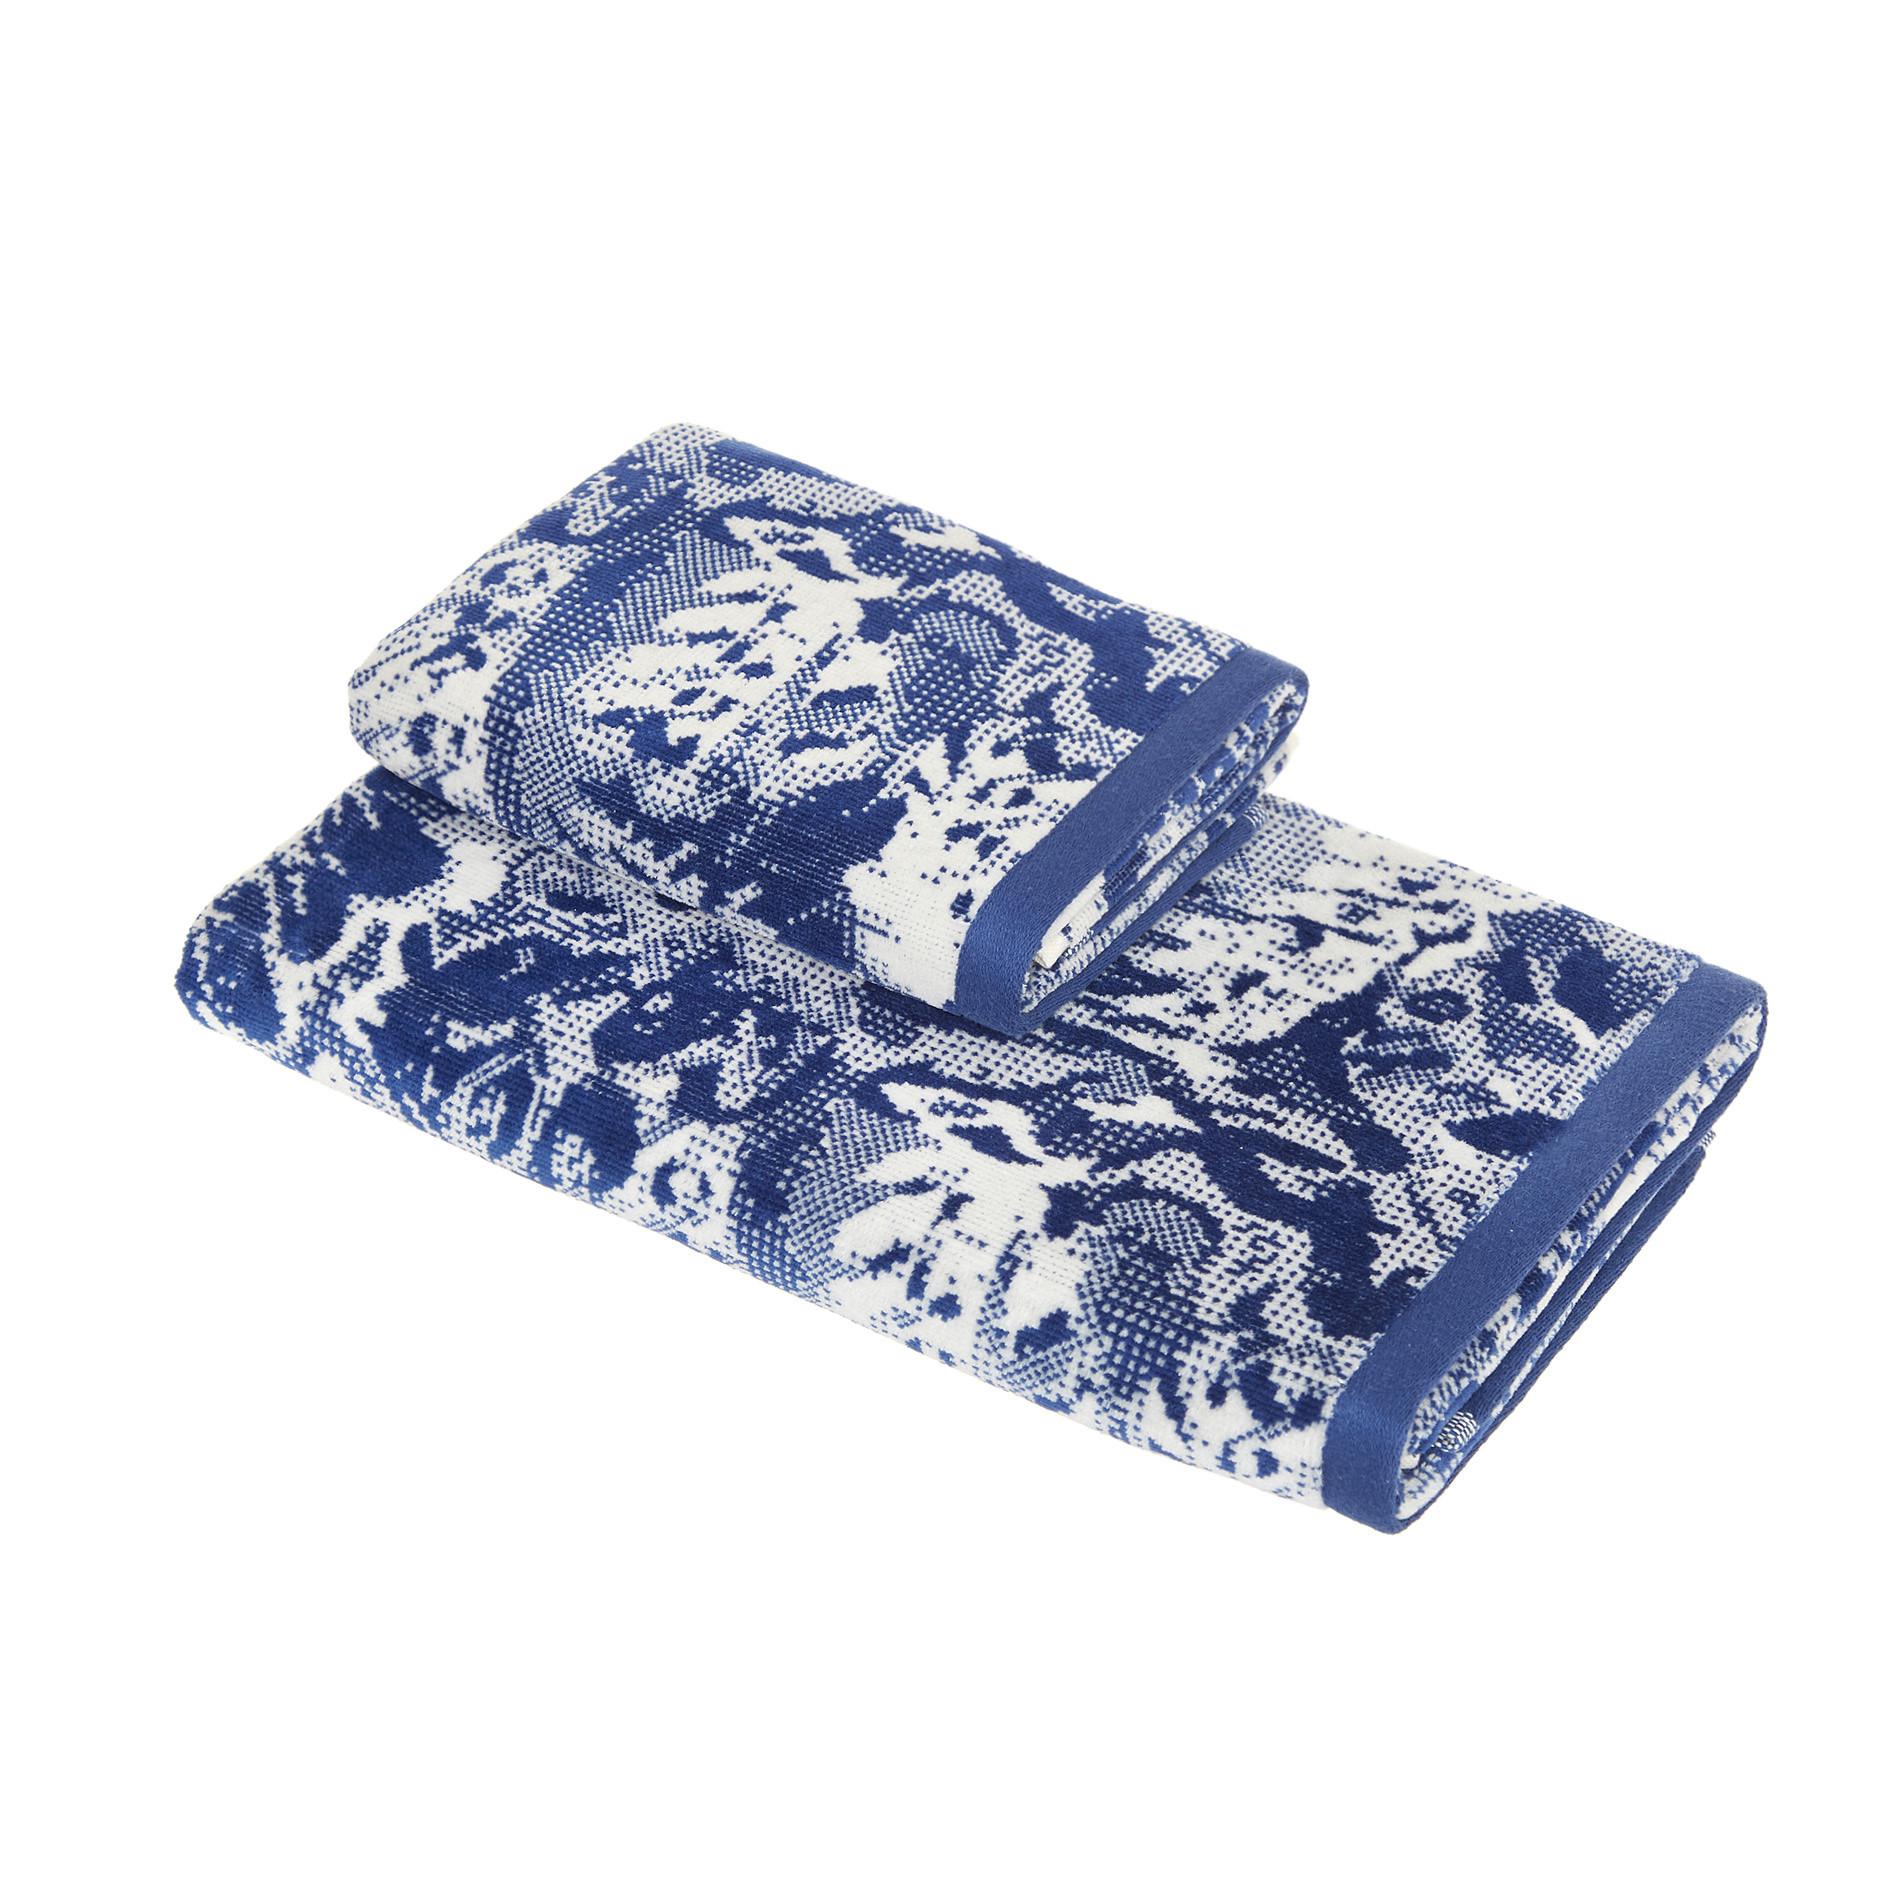 Asciugamano cotone velour motivo floreale, Blu, large image number 0